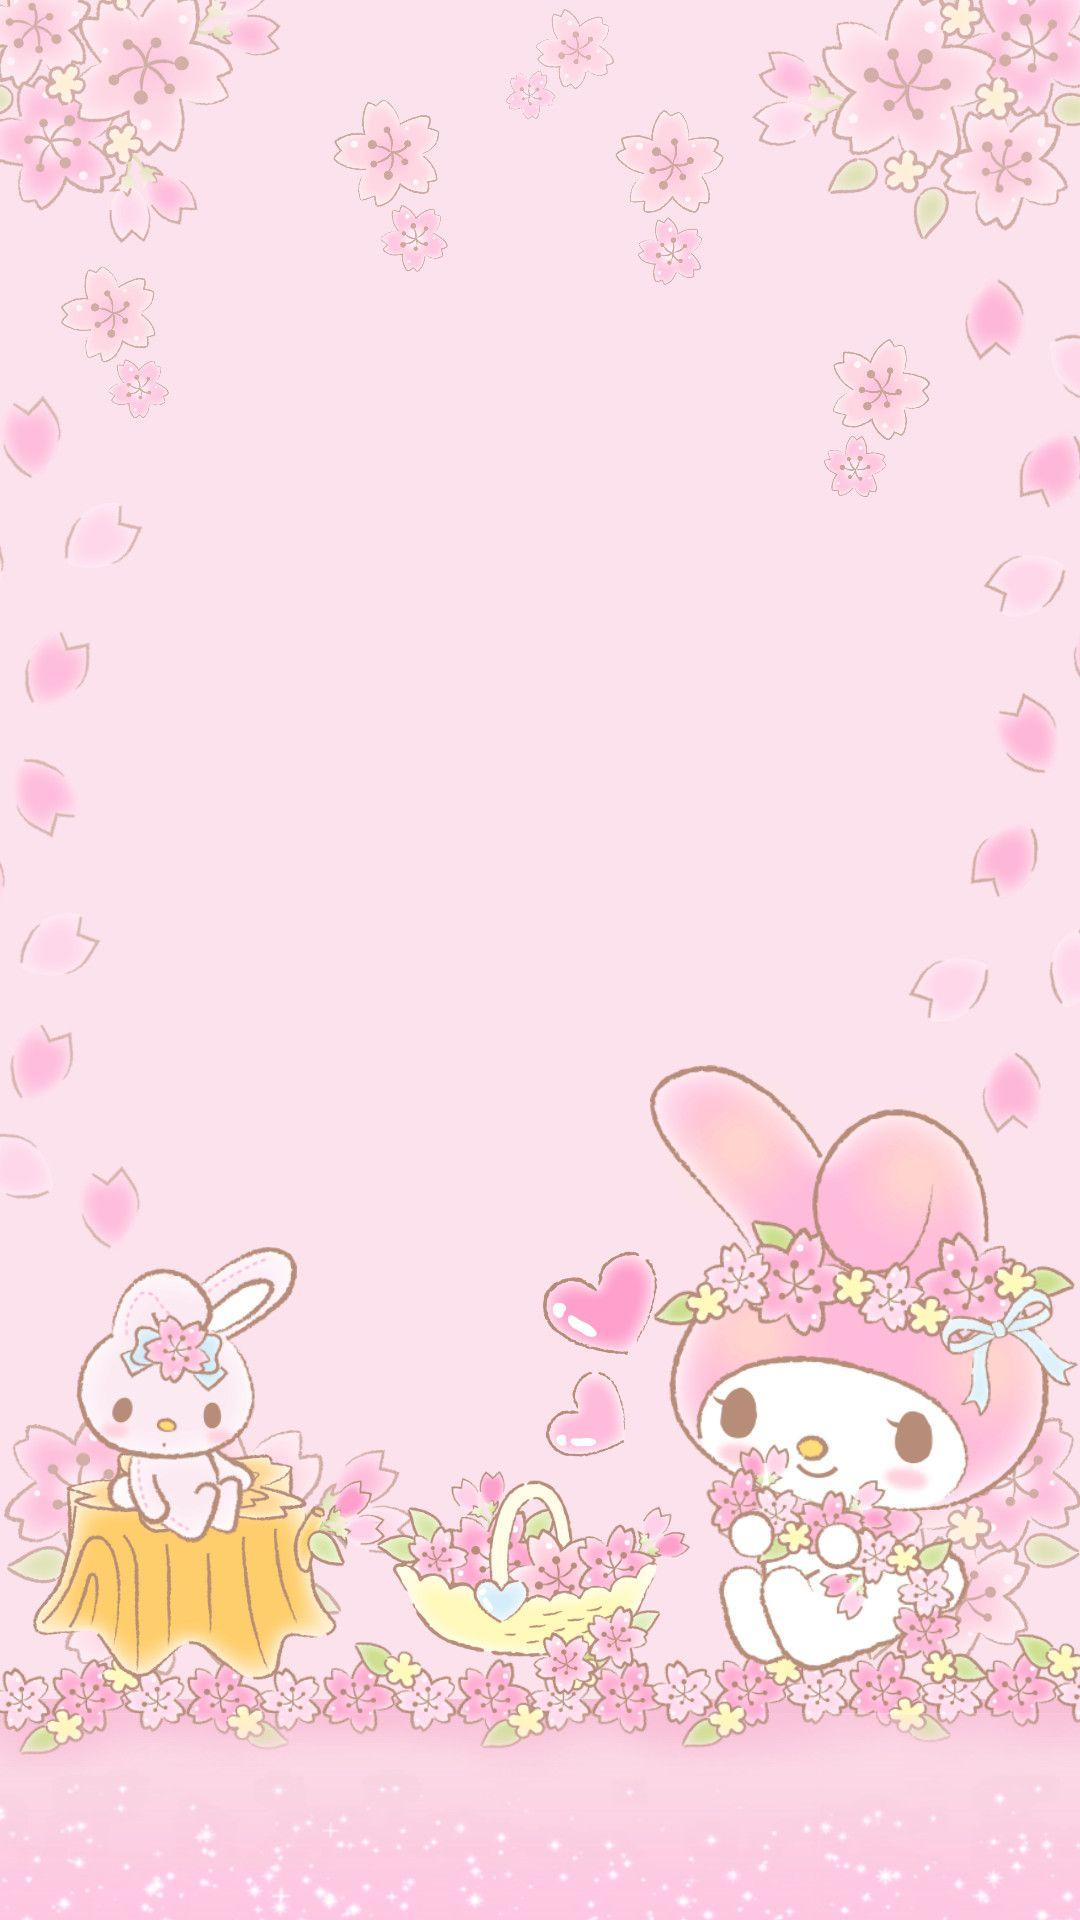 1080x1920 Heymi243 My Melody Hello Kitty Wallpapers My Melody Wallpaper Melody Hello Kitty Hello Kitty Images